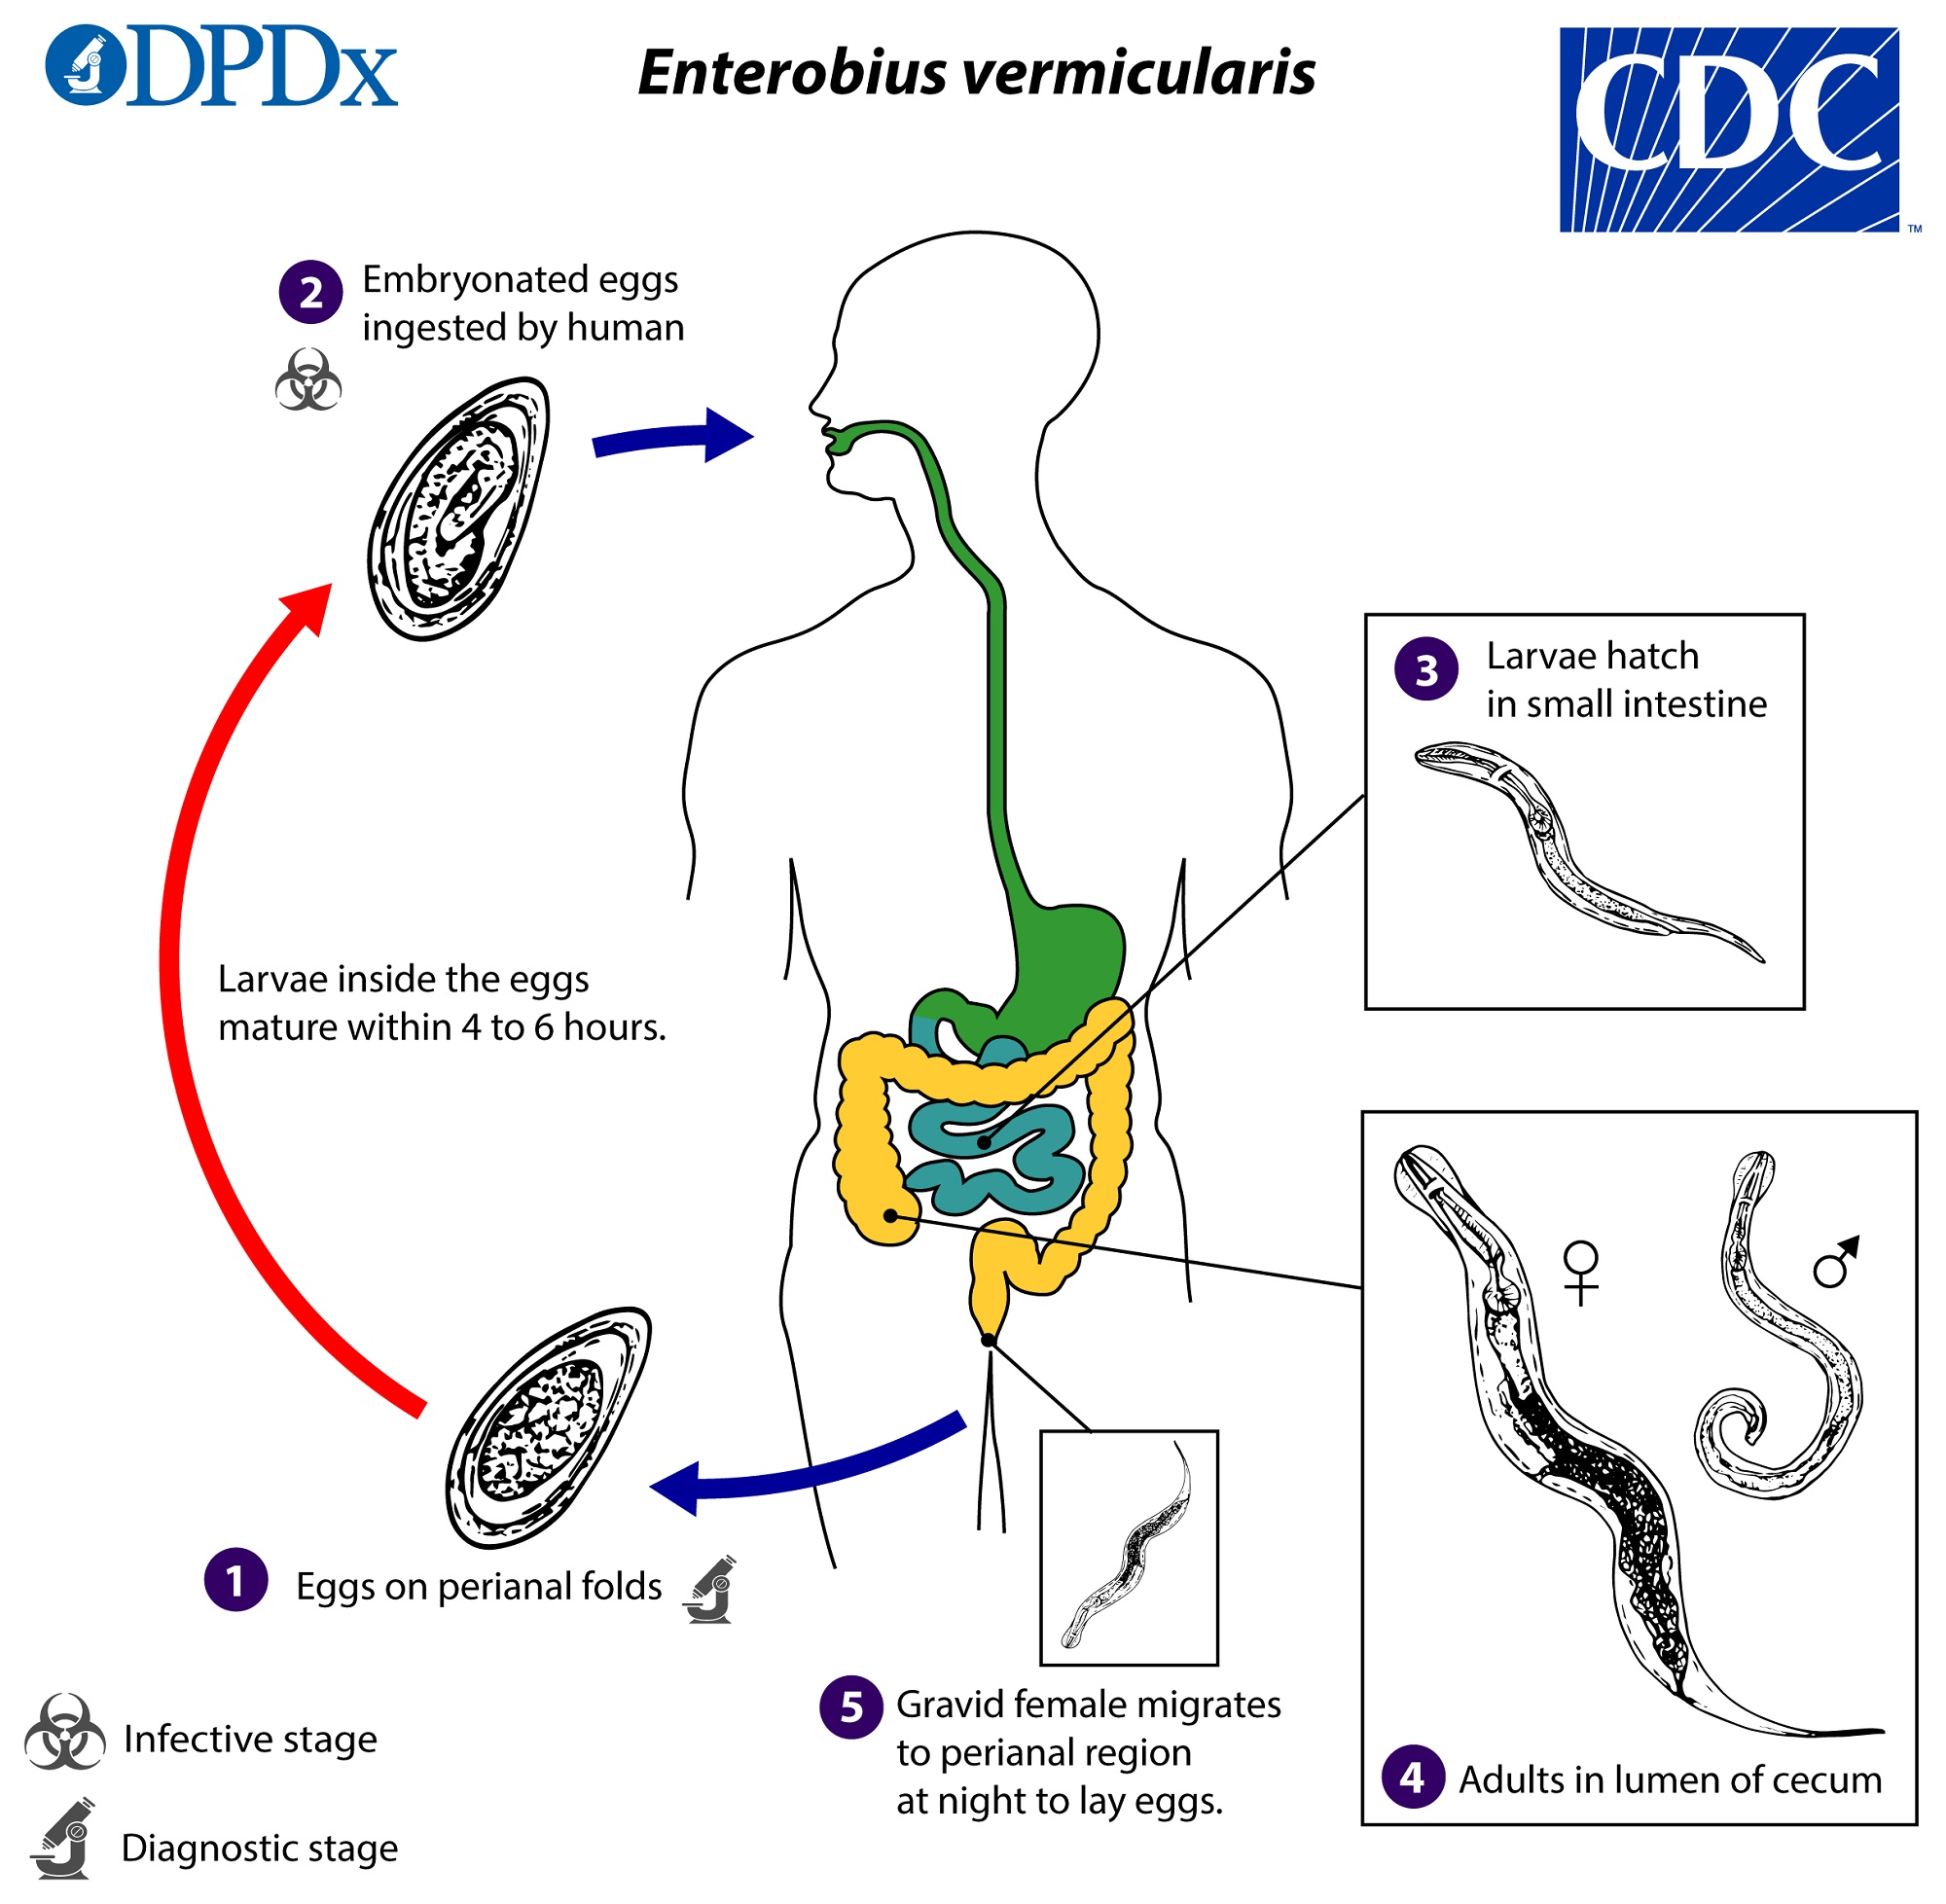 oxyuris vermicularis symptoms conjunctival papillomas prognosis